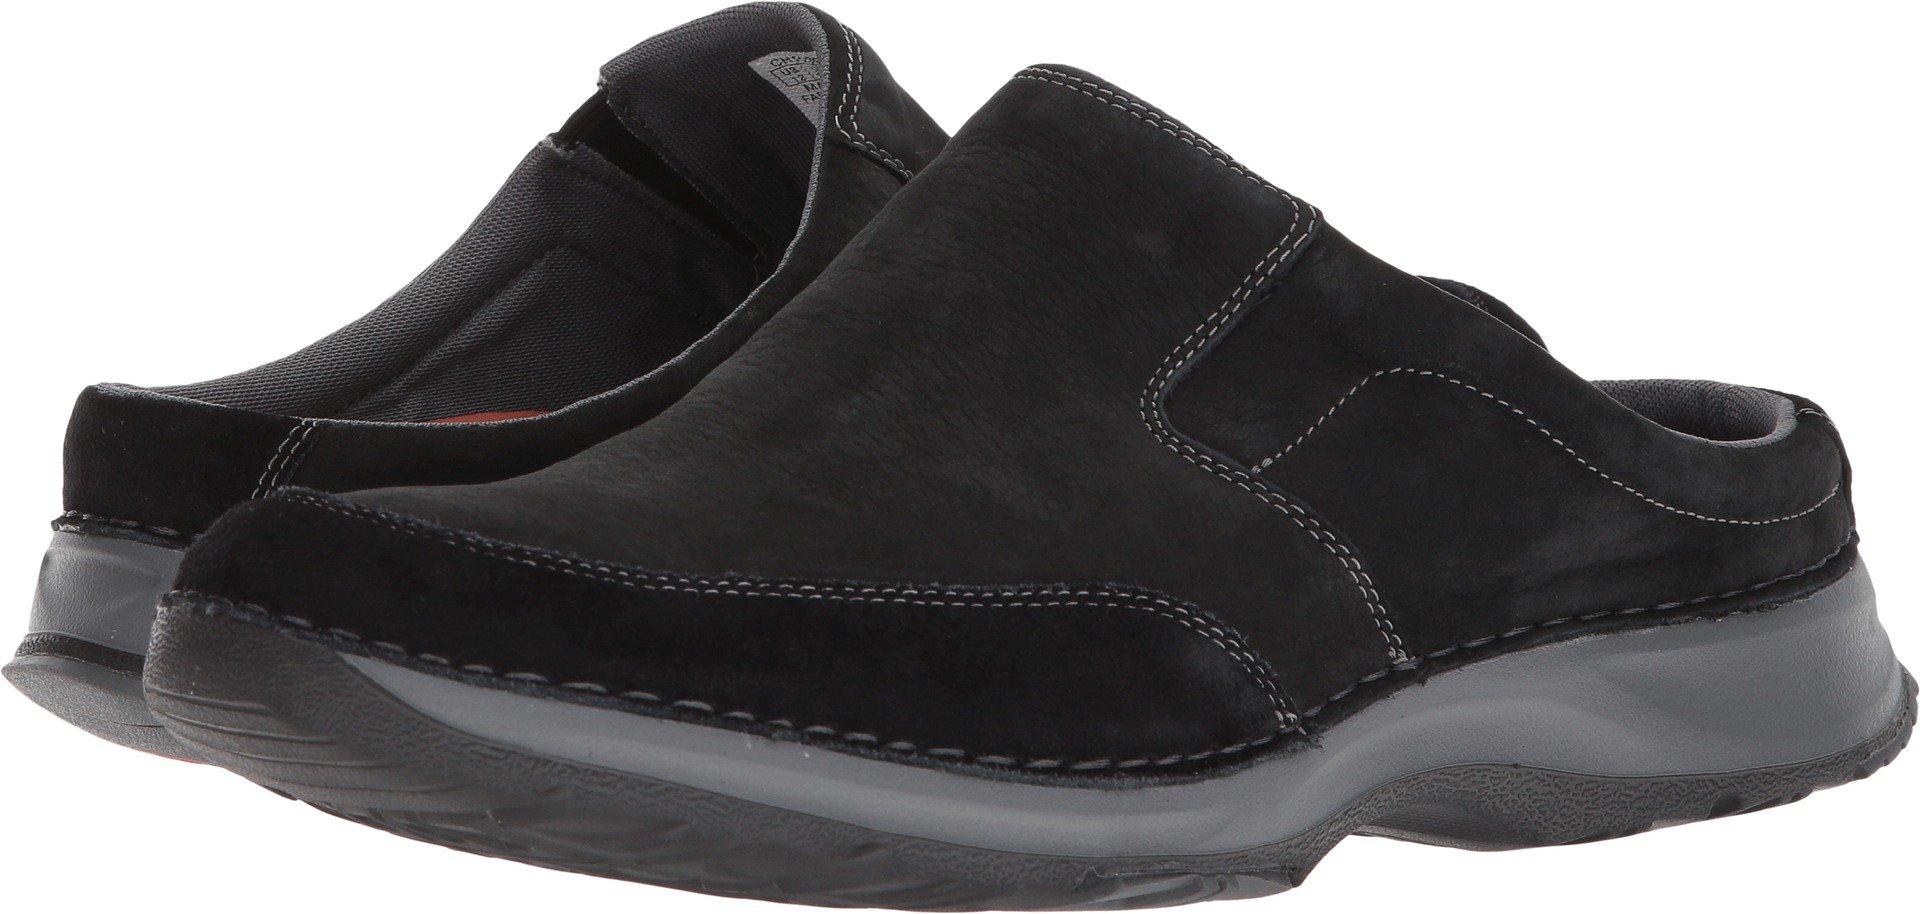 Rockport Men's RocSports Lite Five Clog Shoe, black leather, 15 W US